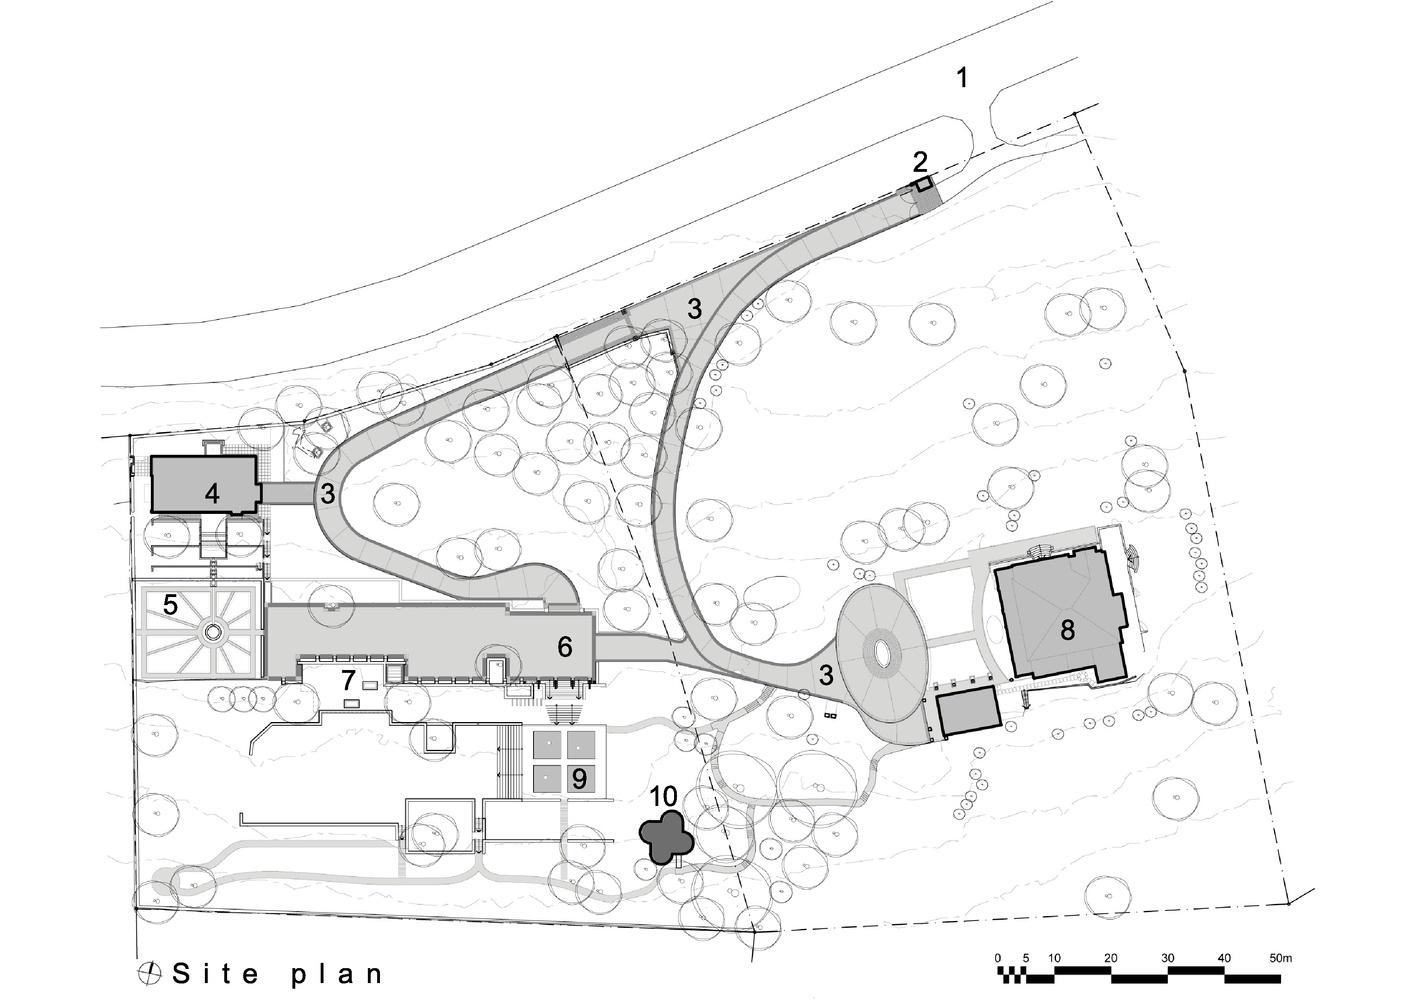 house_paarman_-_tree_house_site_plan0001